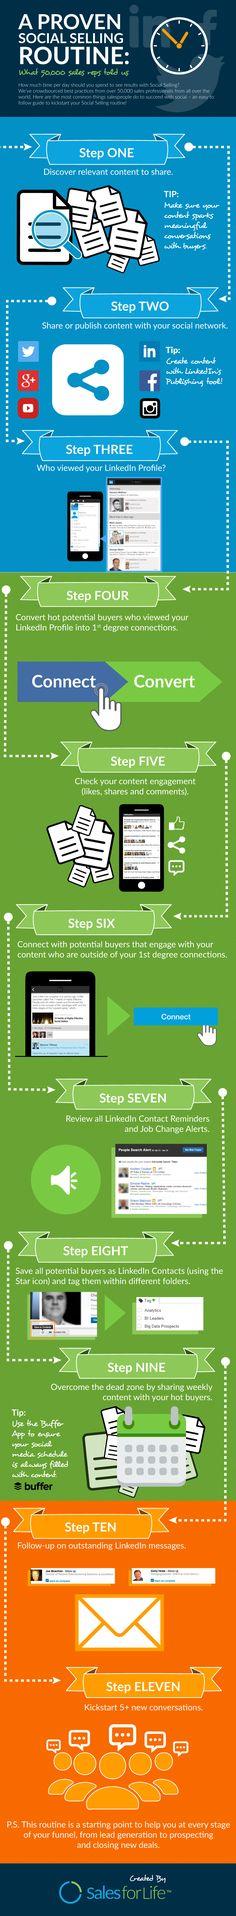 The Ideal Social Selling Routine! #Socialmedia #Web #Marketing #Entrepreneur #Startup